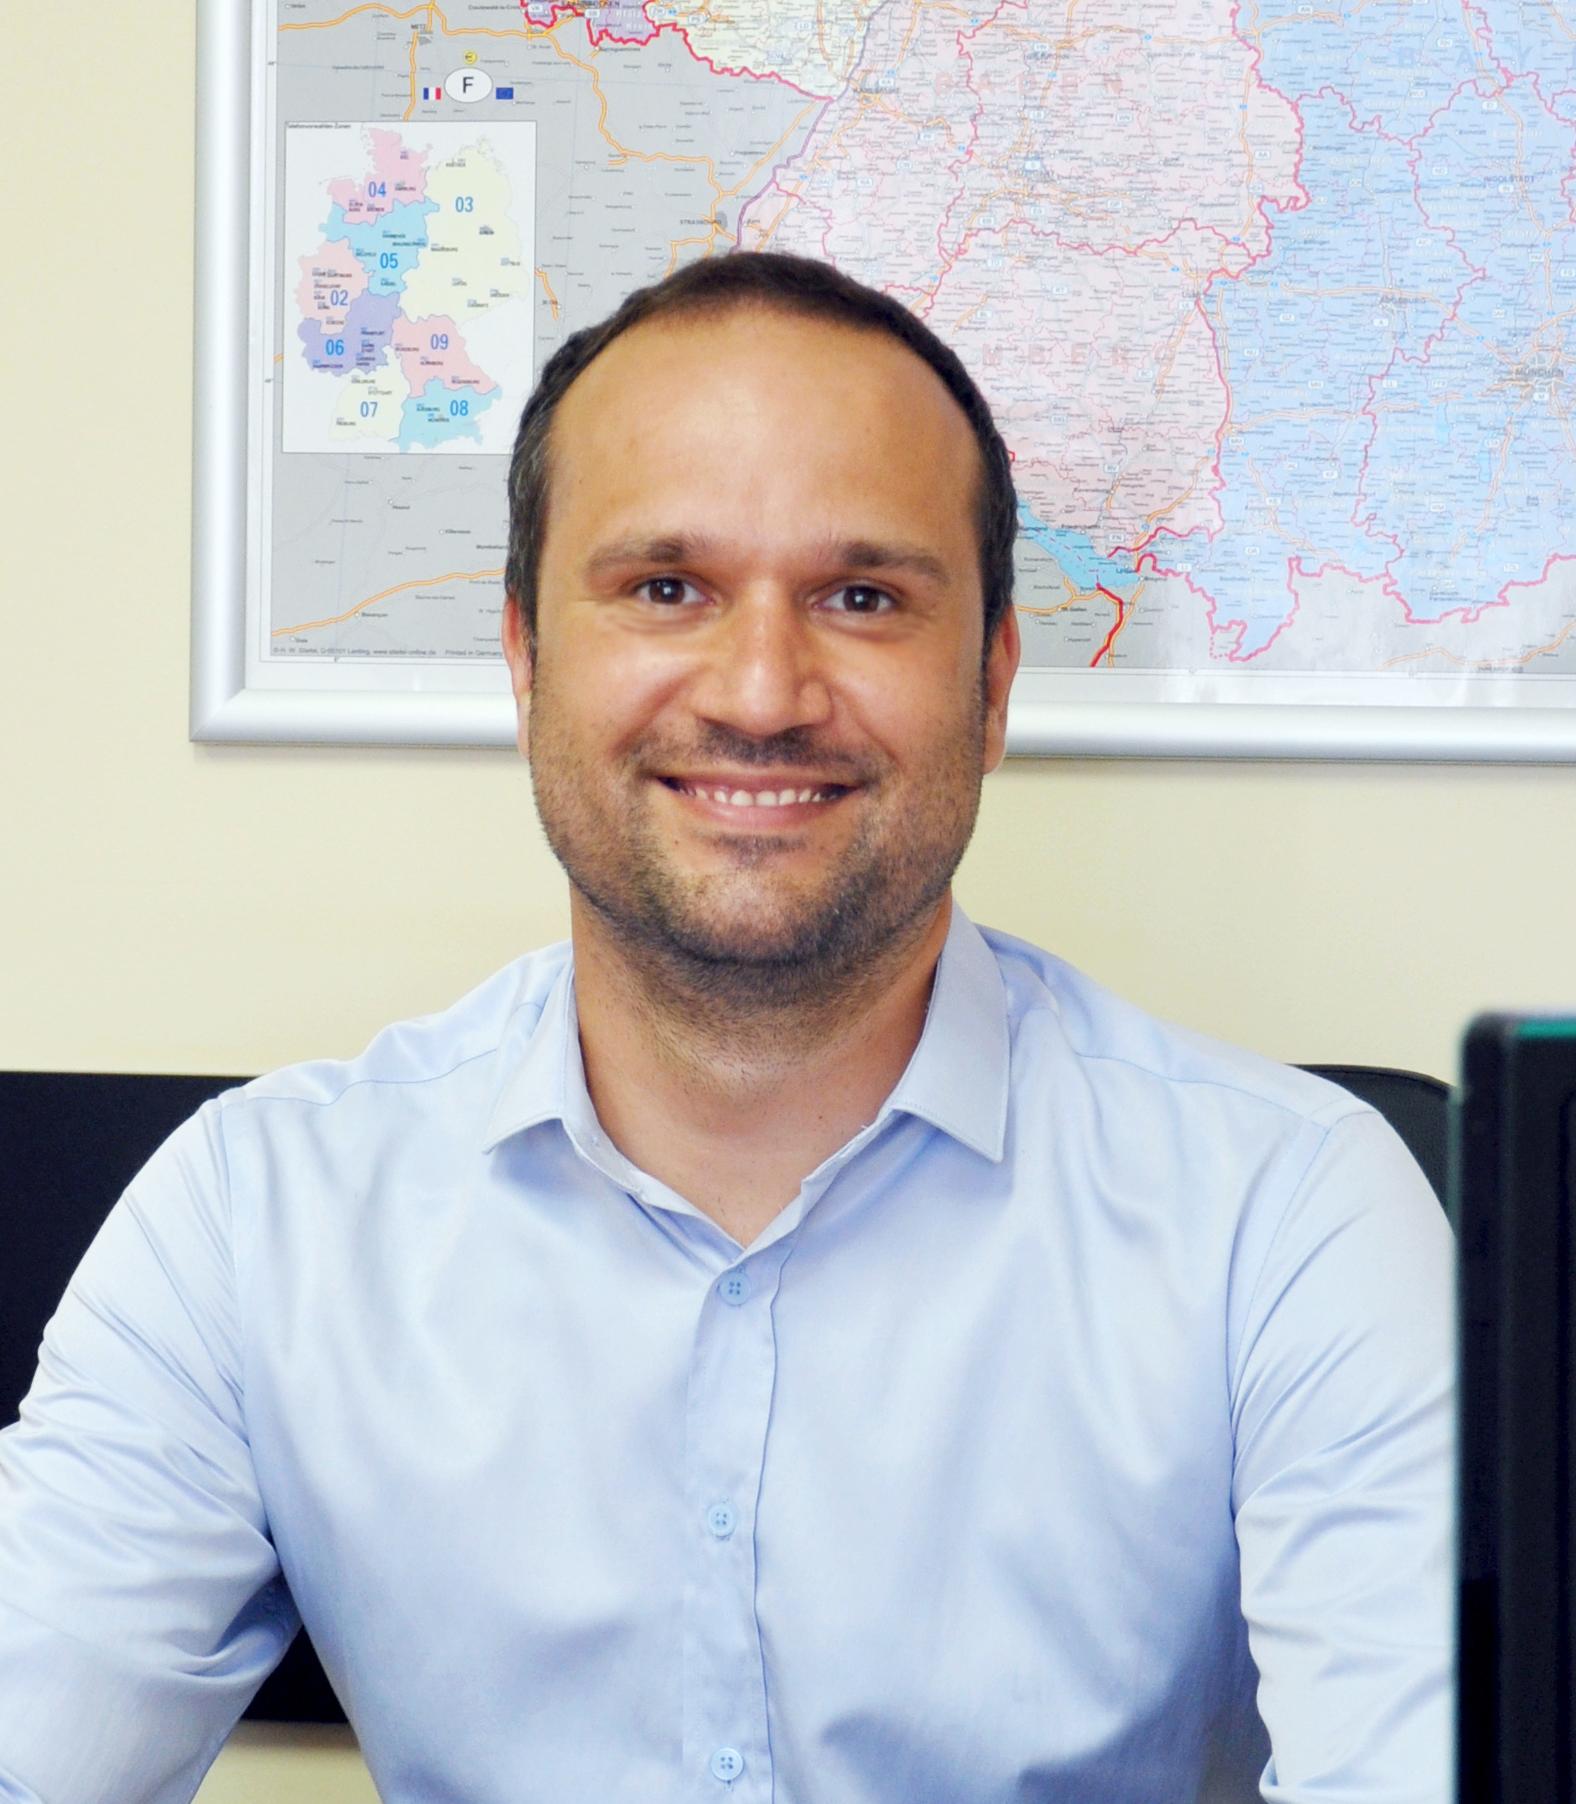 Atanas Velinov : Service Manager